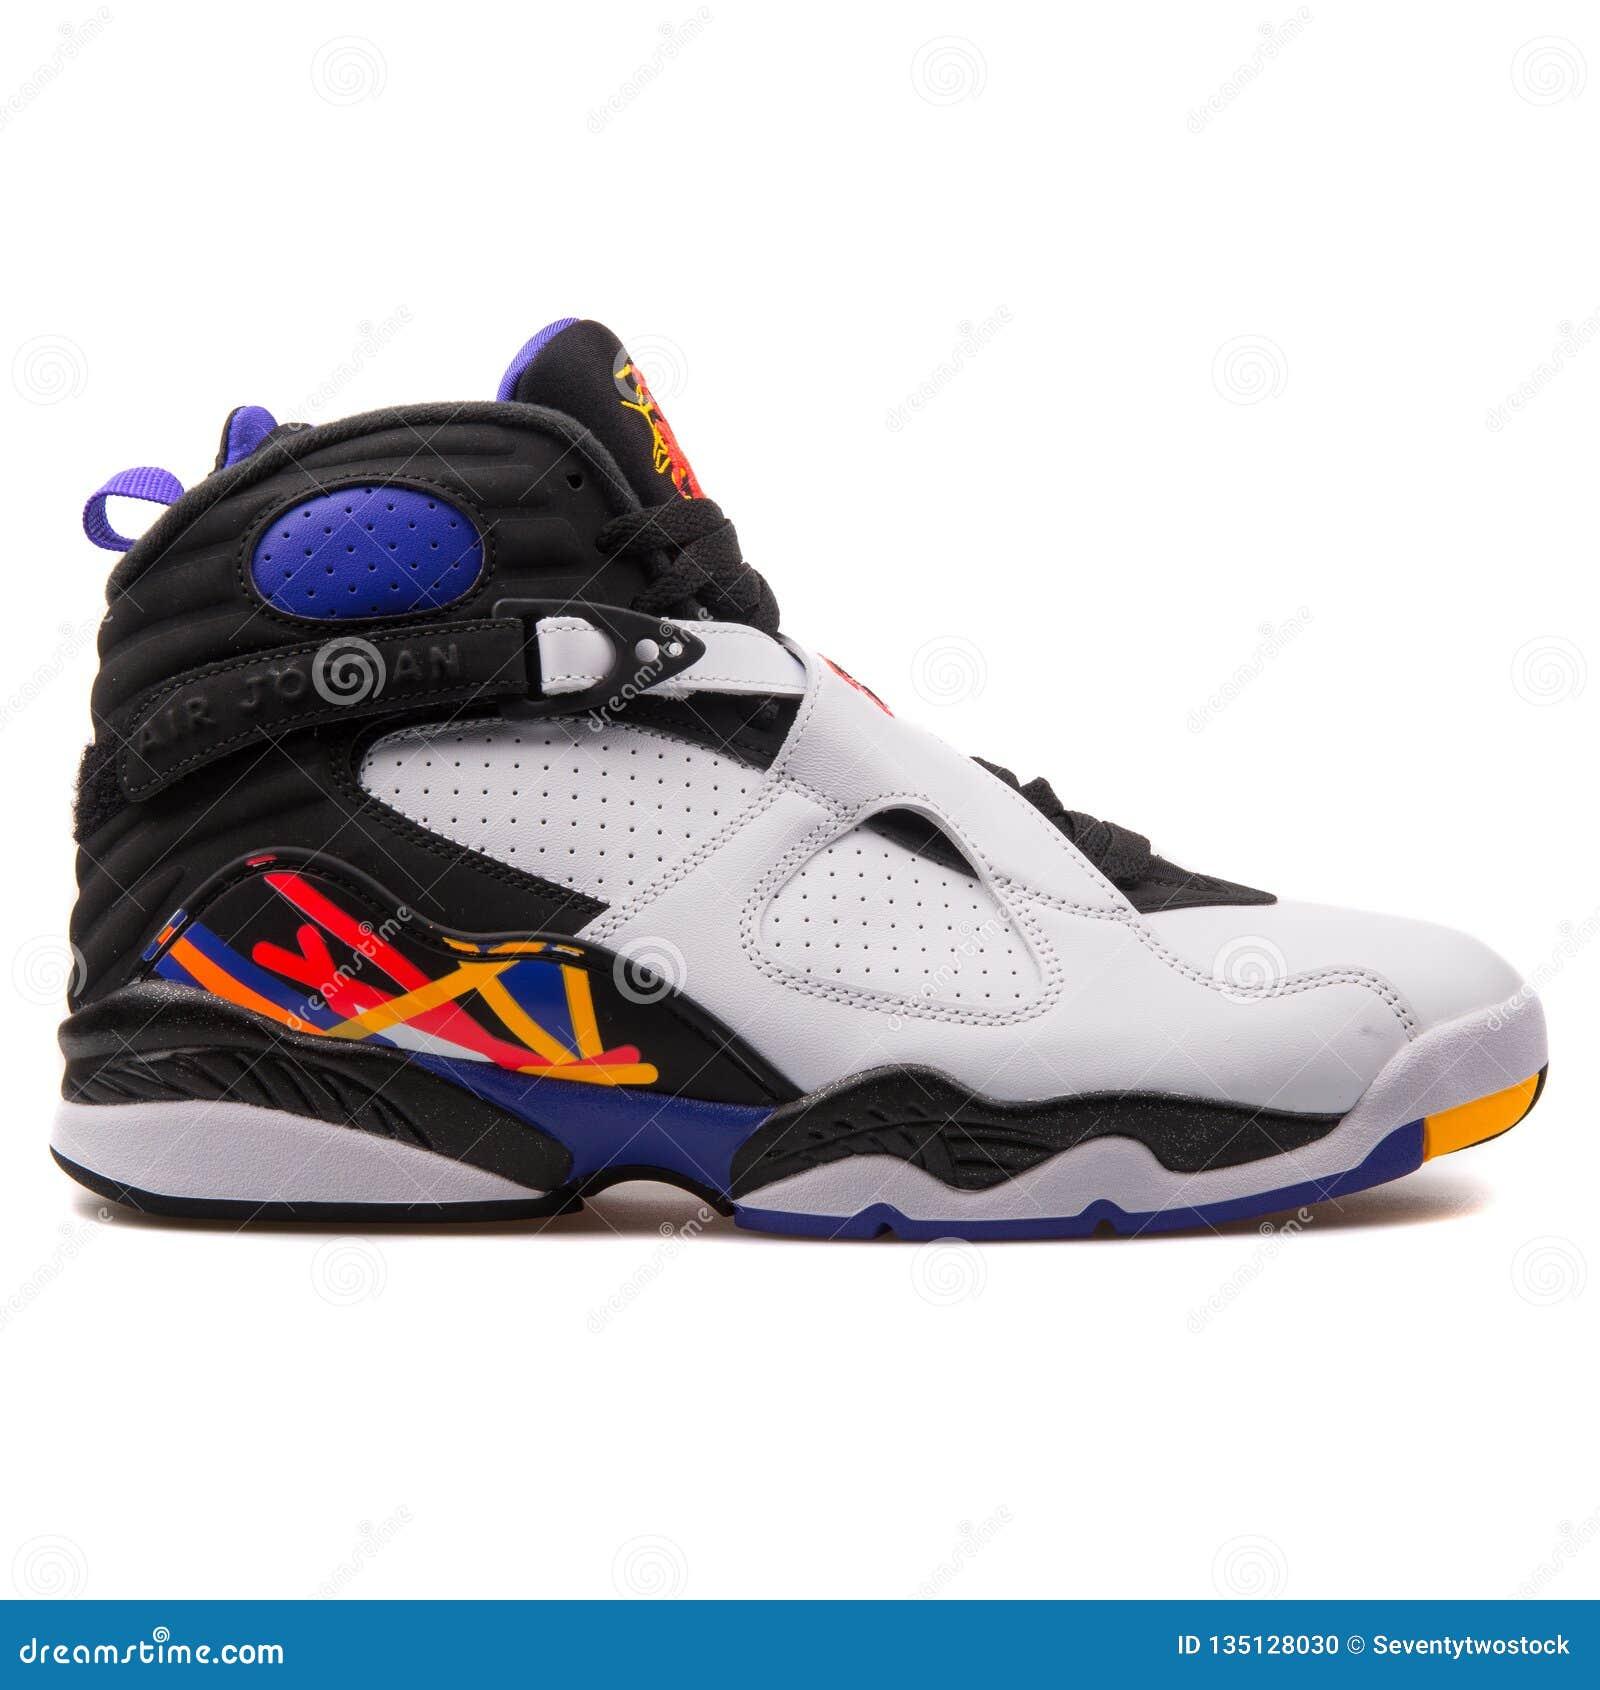 Nike Air Jordan 8 Retro White, Black